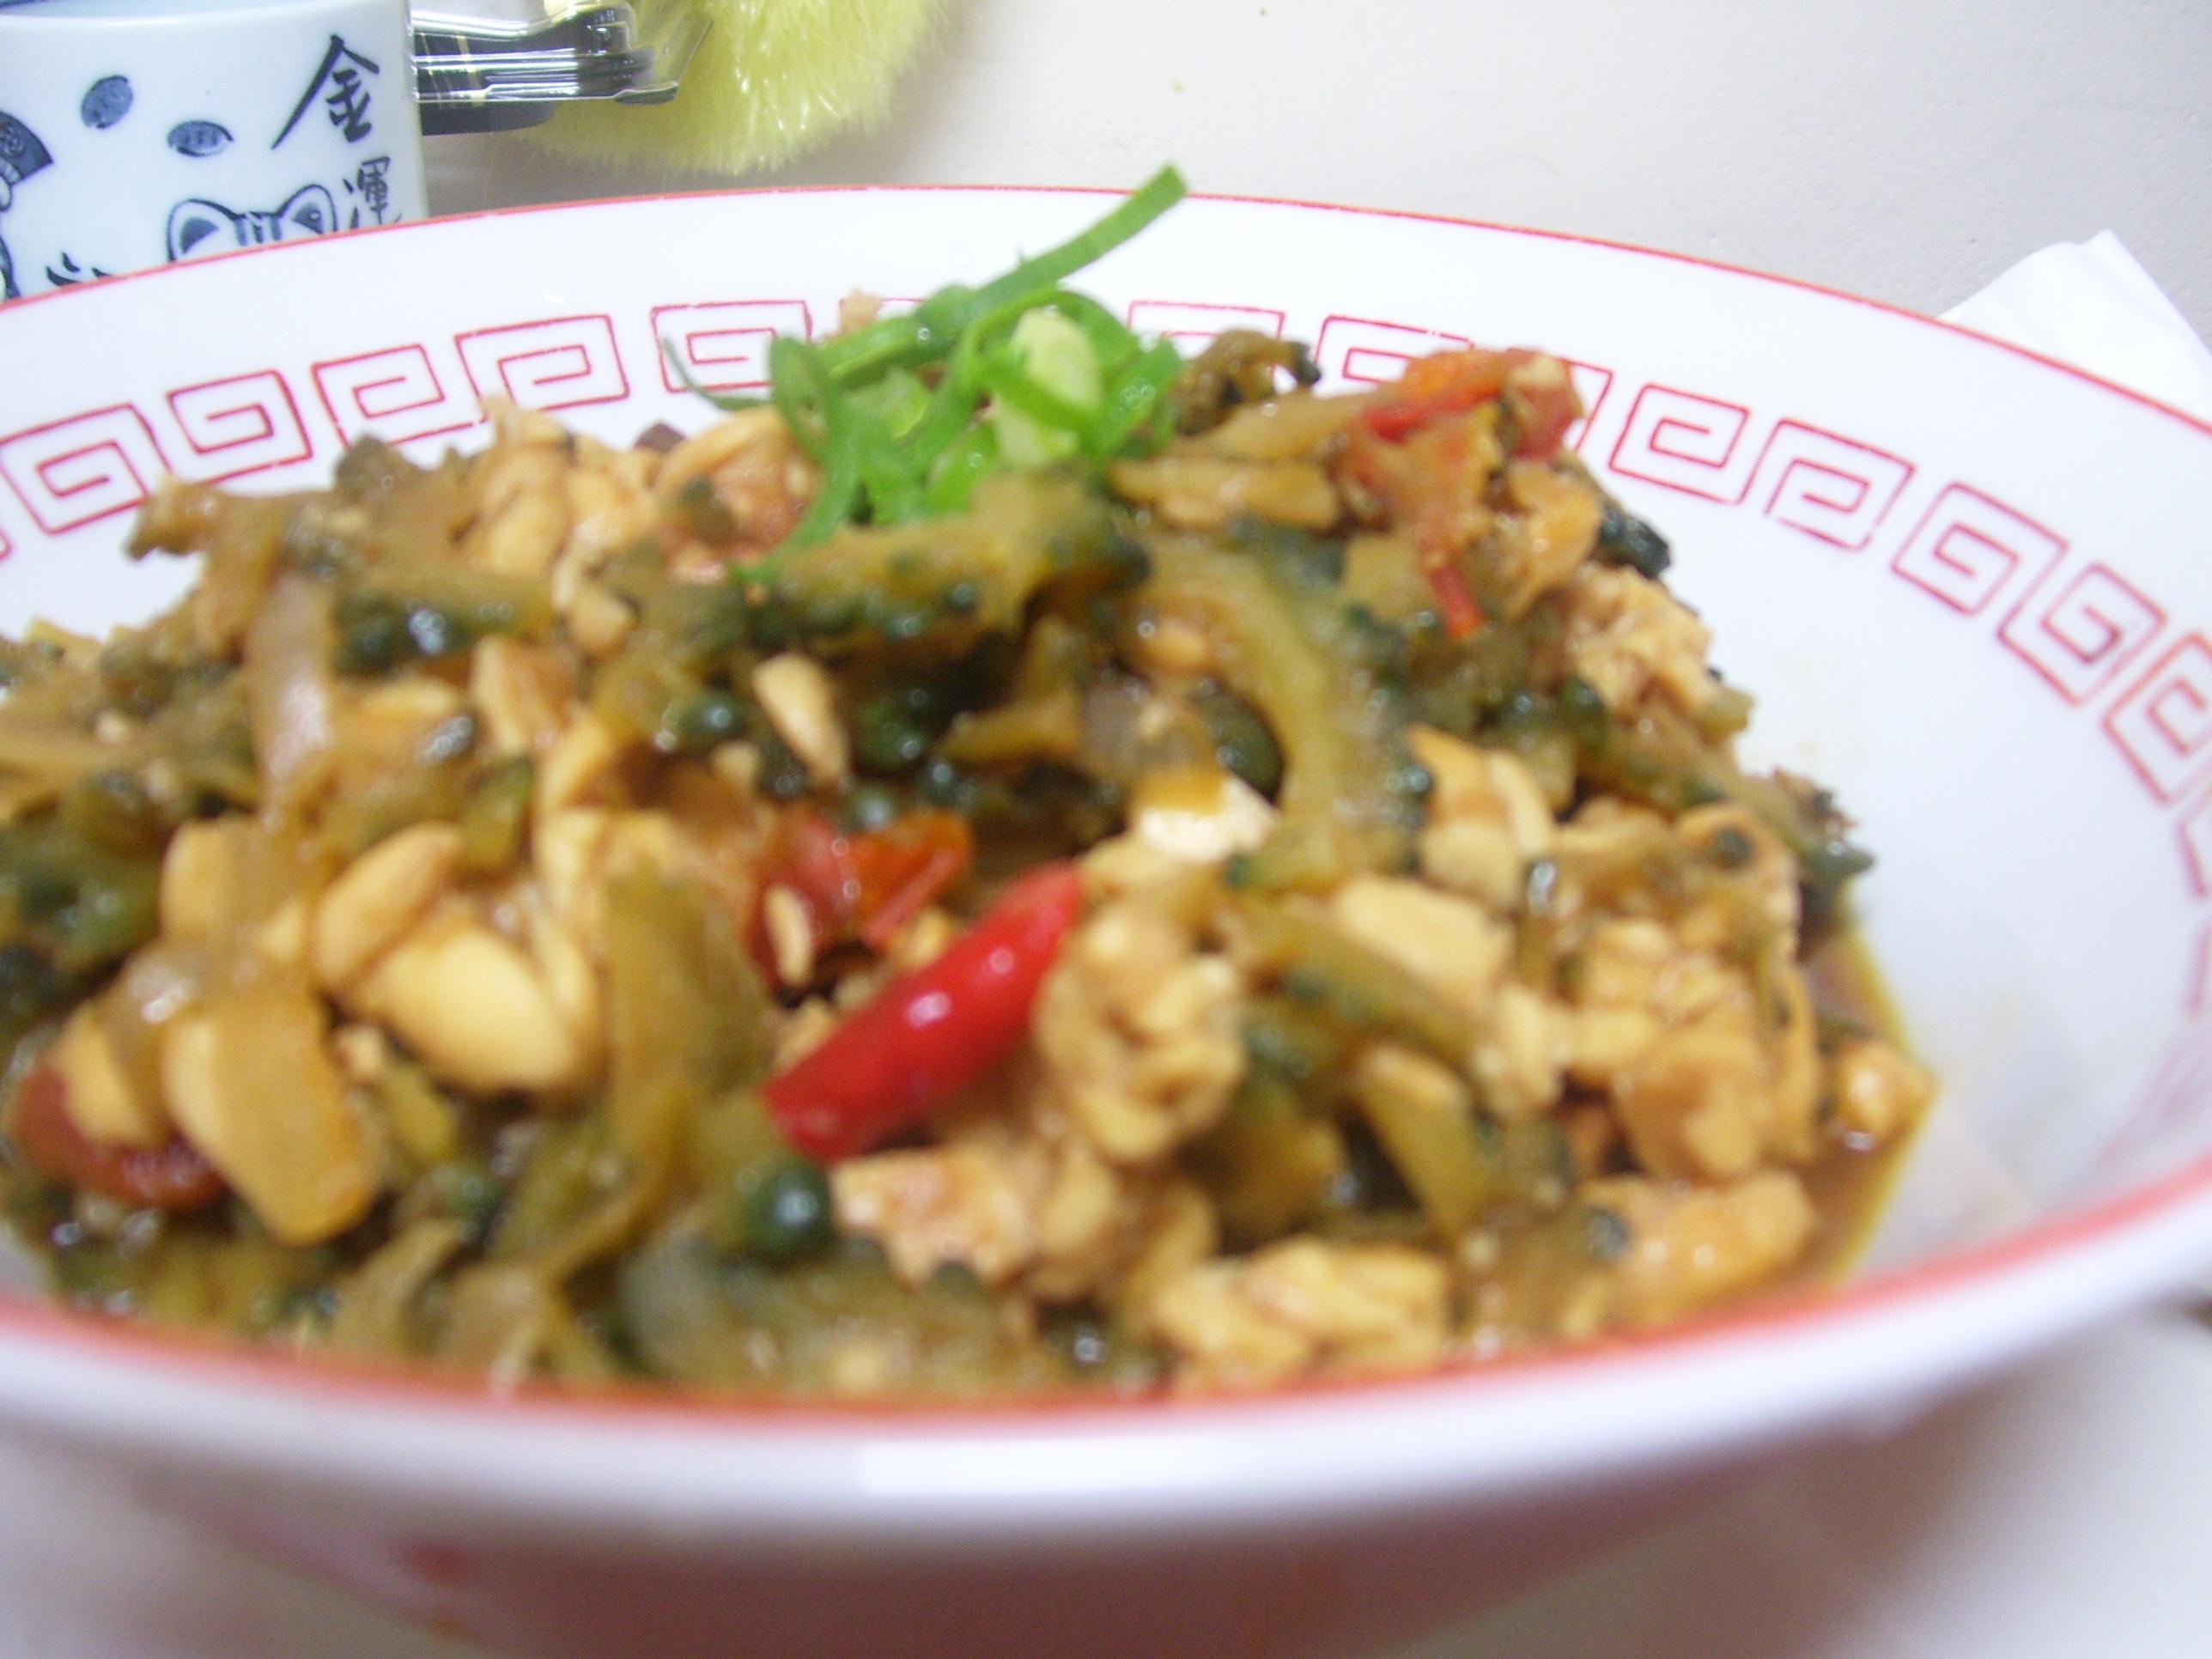 Image Result For Resep Masakan Tempe Ala Jepang